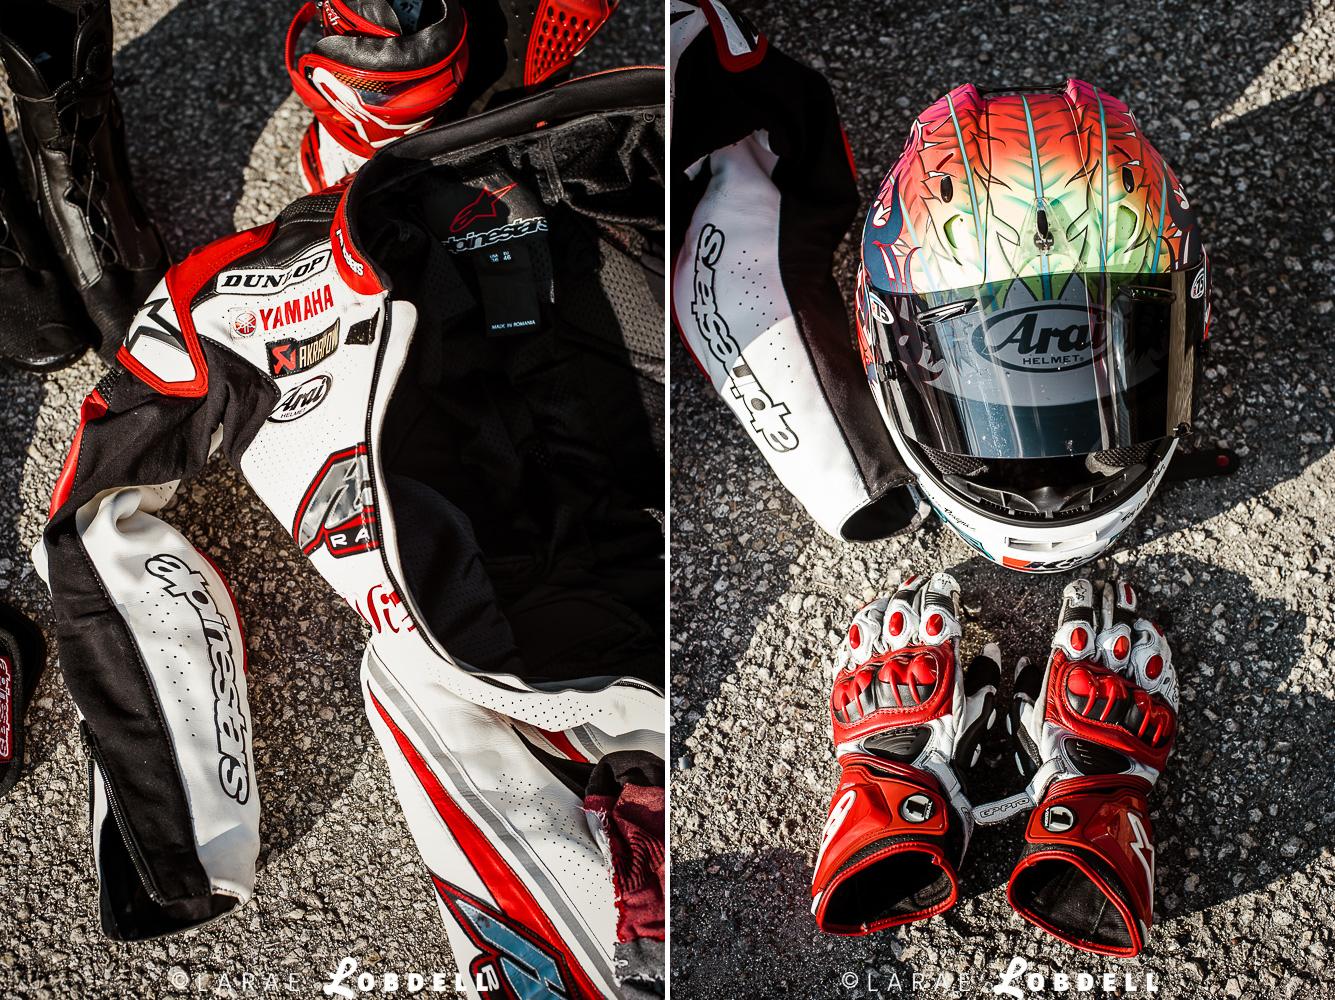 Huntley Nash, Homestead-Miami Speedway, March 22, 2015